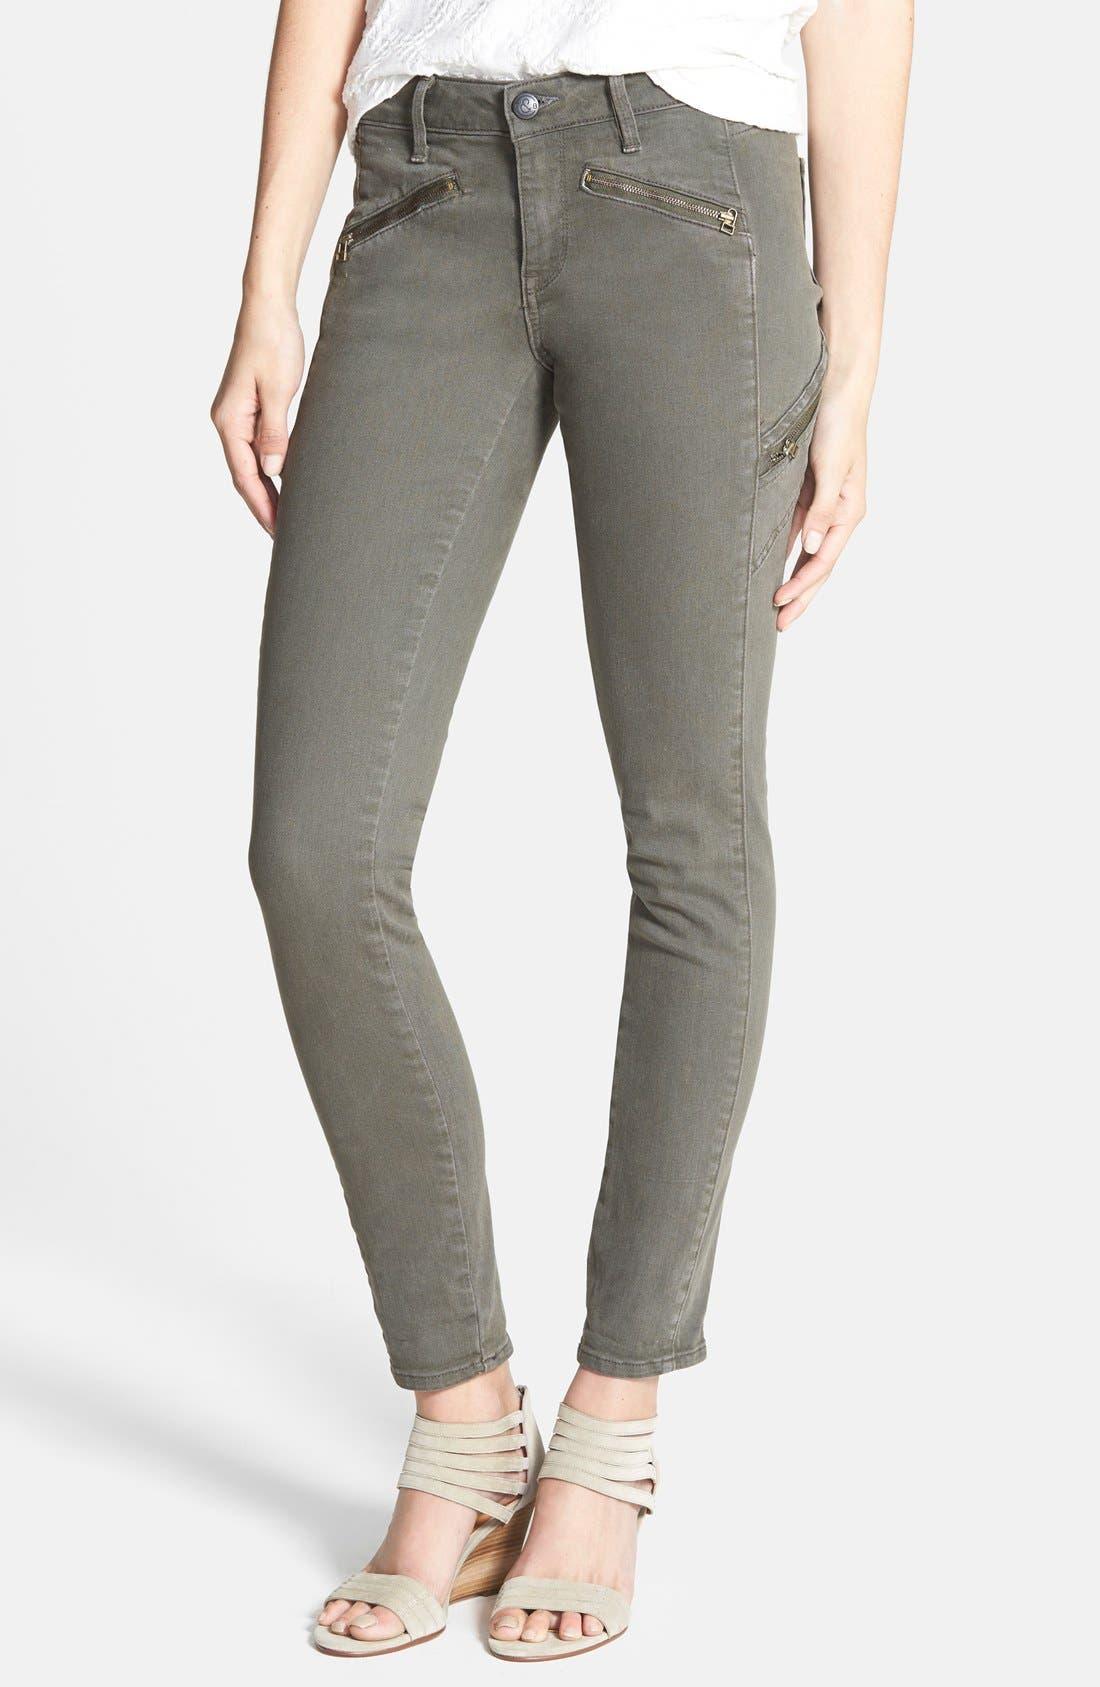 Main Image - Treasure&Bond Zip Skinny Jeans (Olive Tarmac)